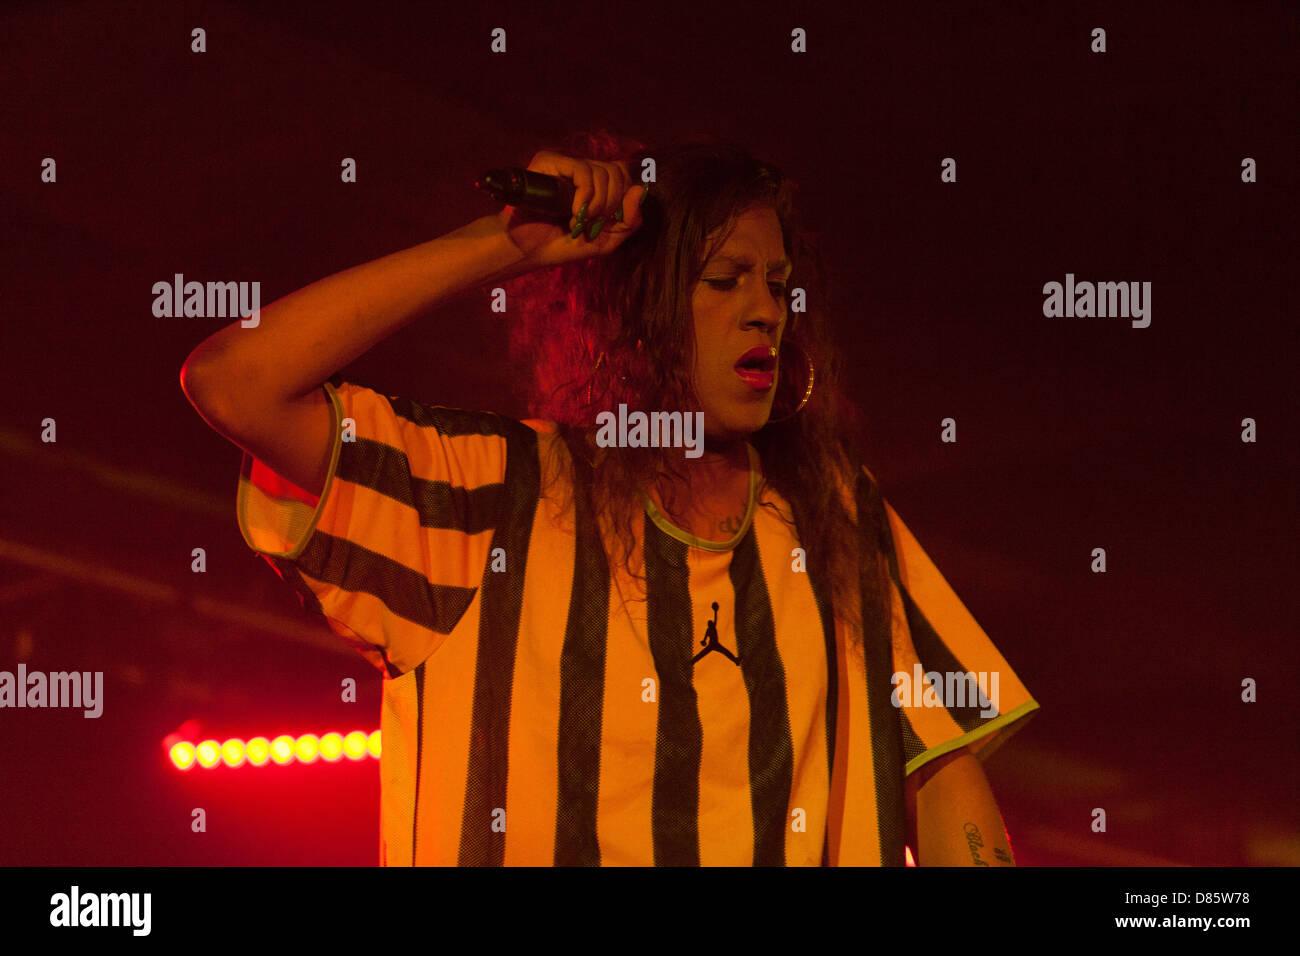 Mykki Blanco (Michael Quattlebaum Jr ), rapper, performance